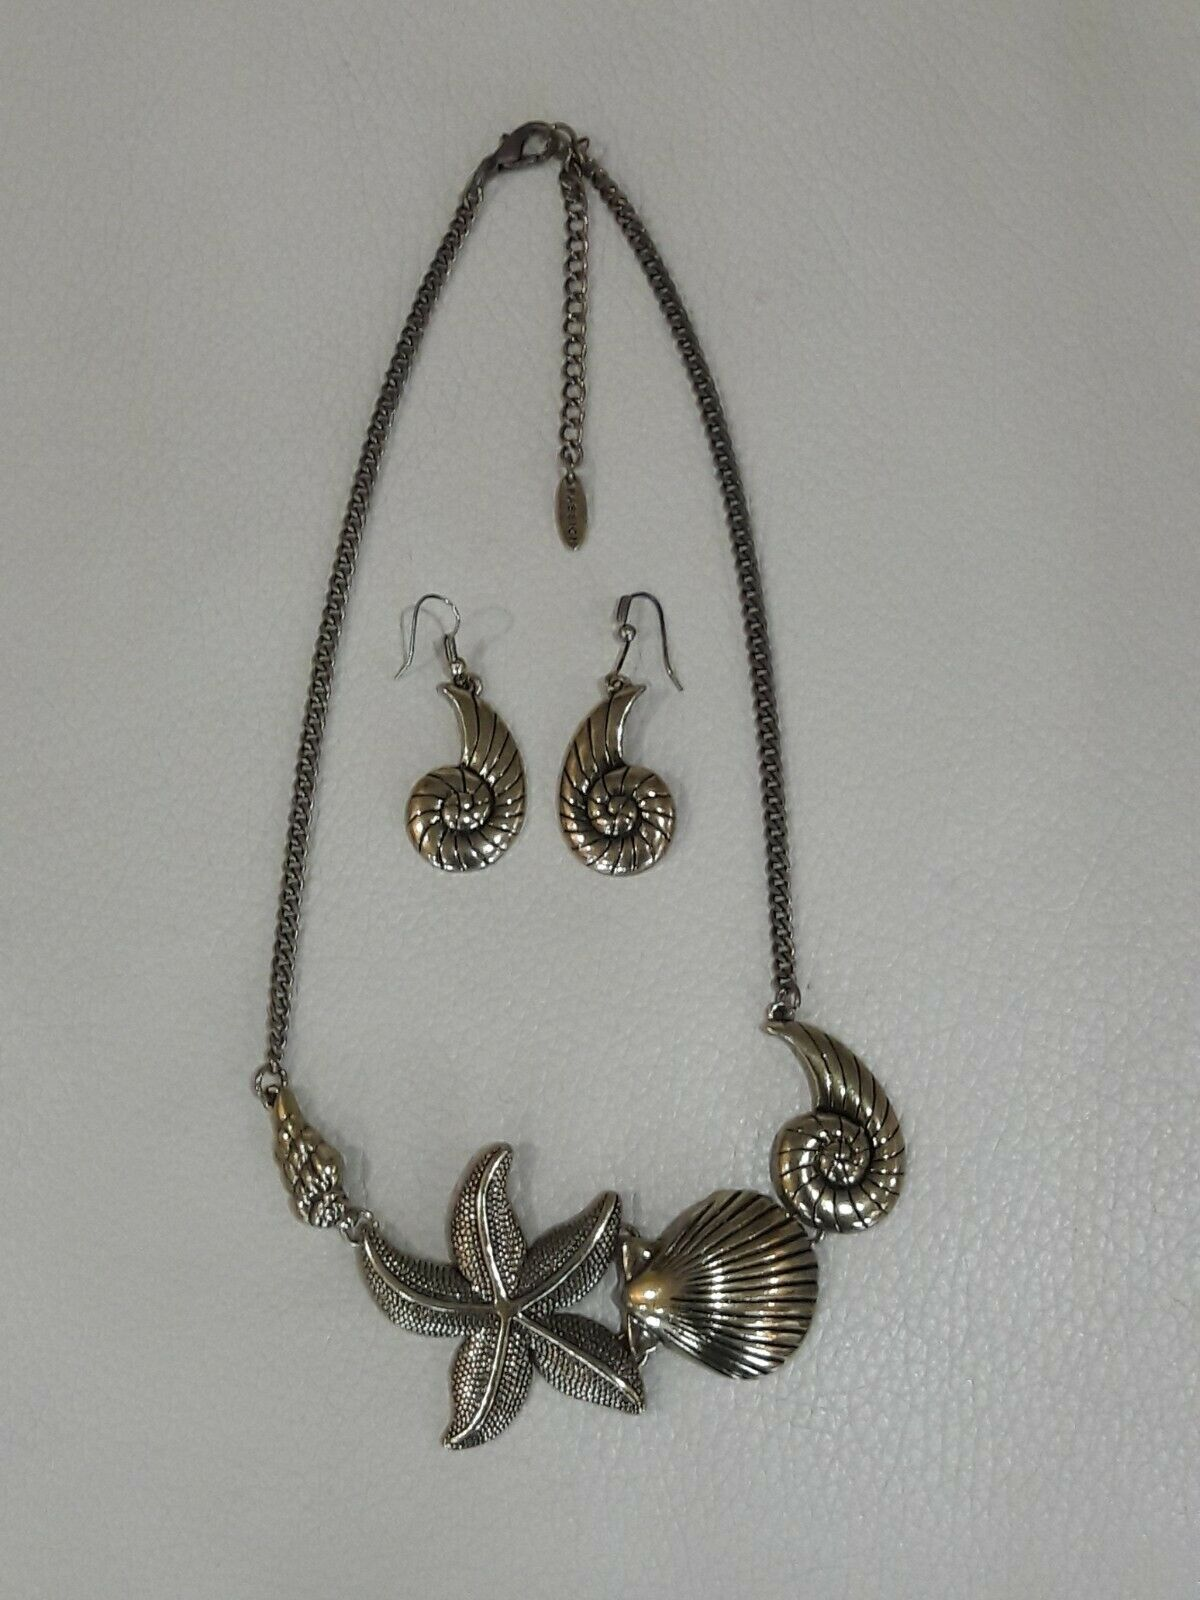 Seashell Necklace Pierced Earrings Pewter Handmade Ocean Nature Pendant Sanibel